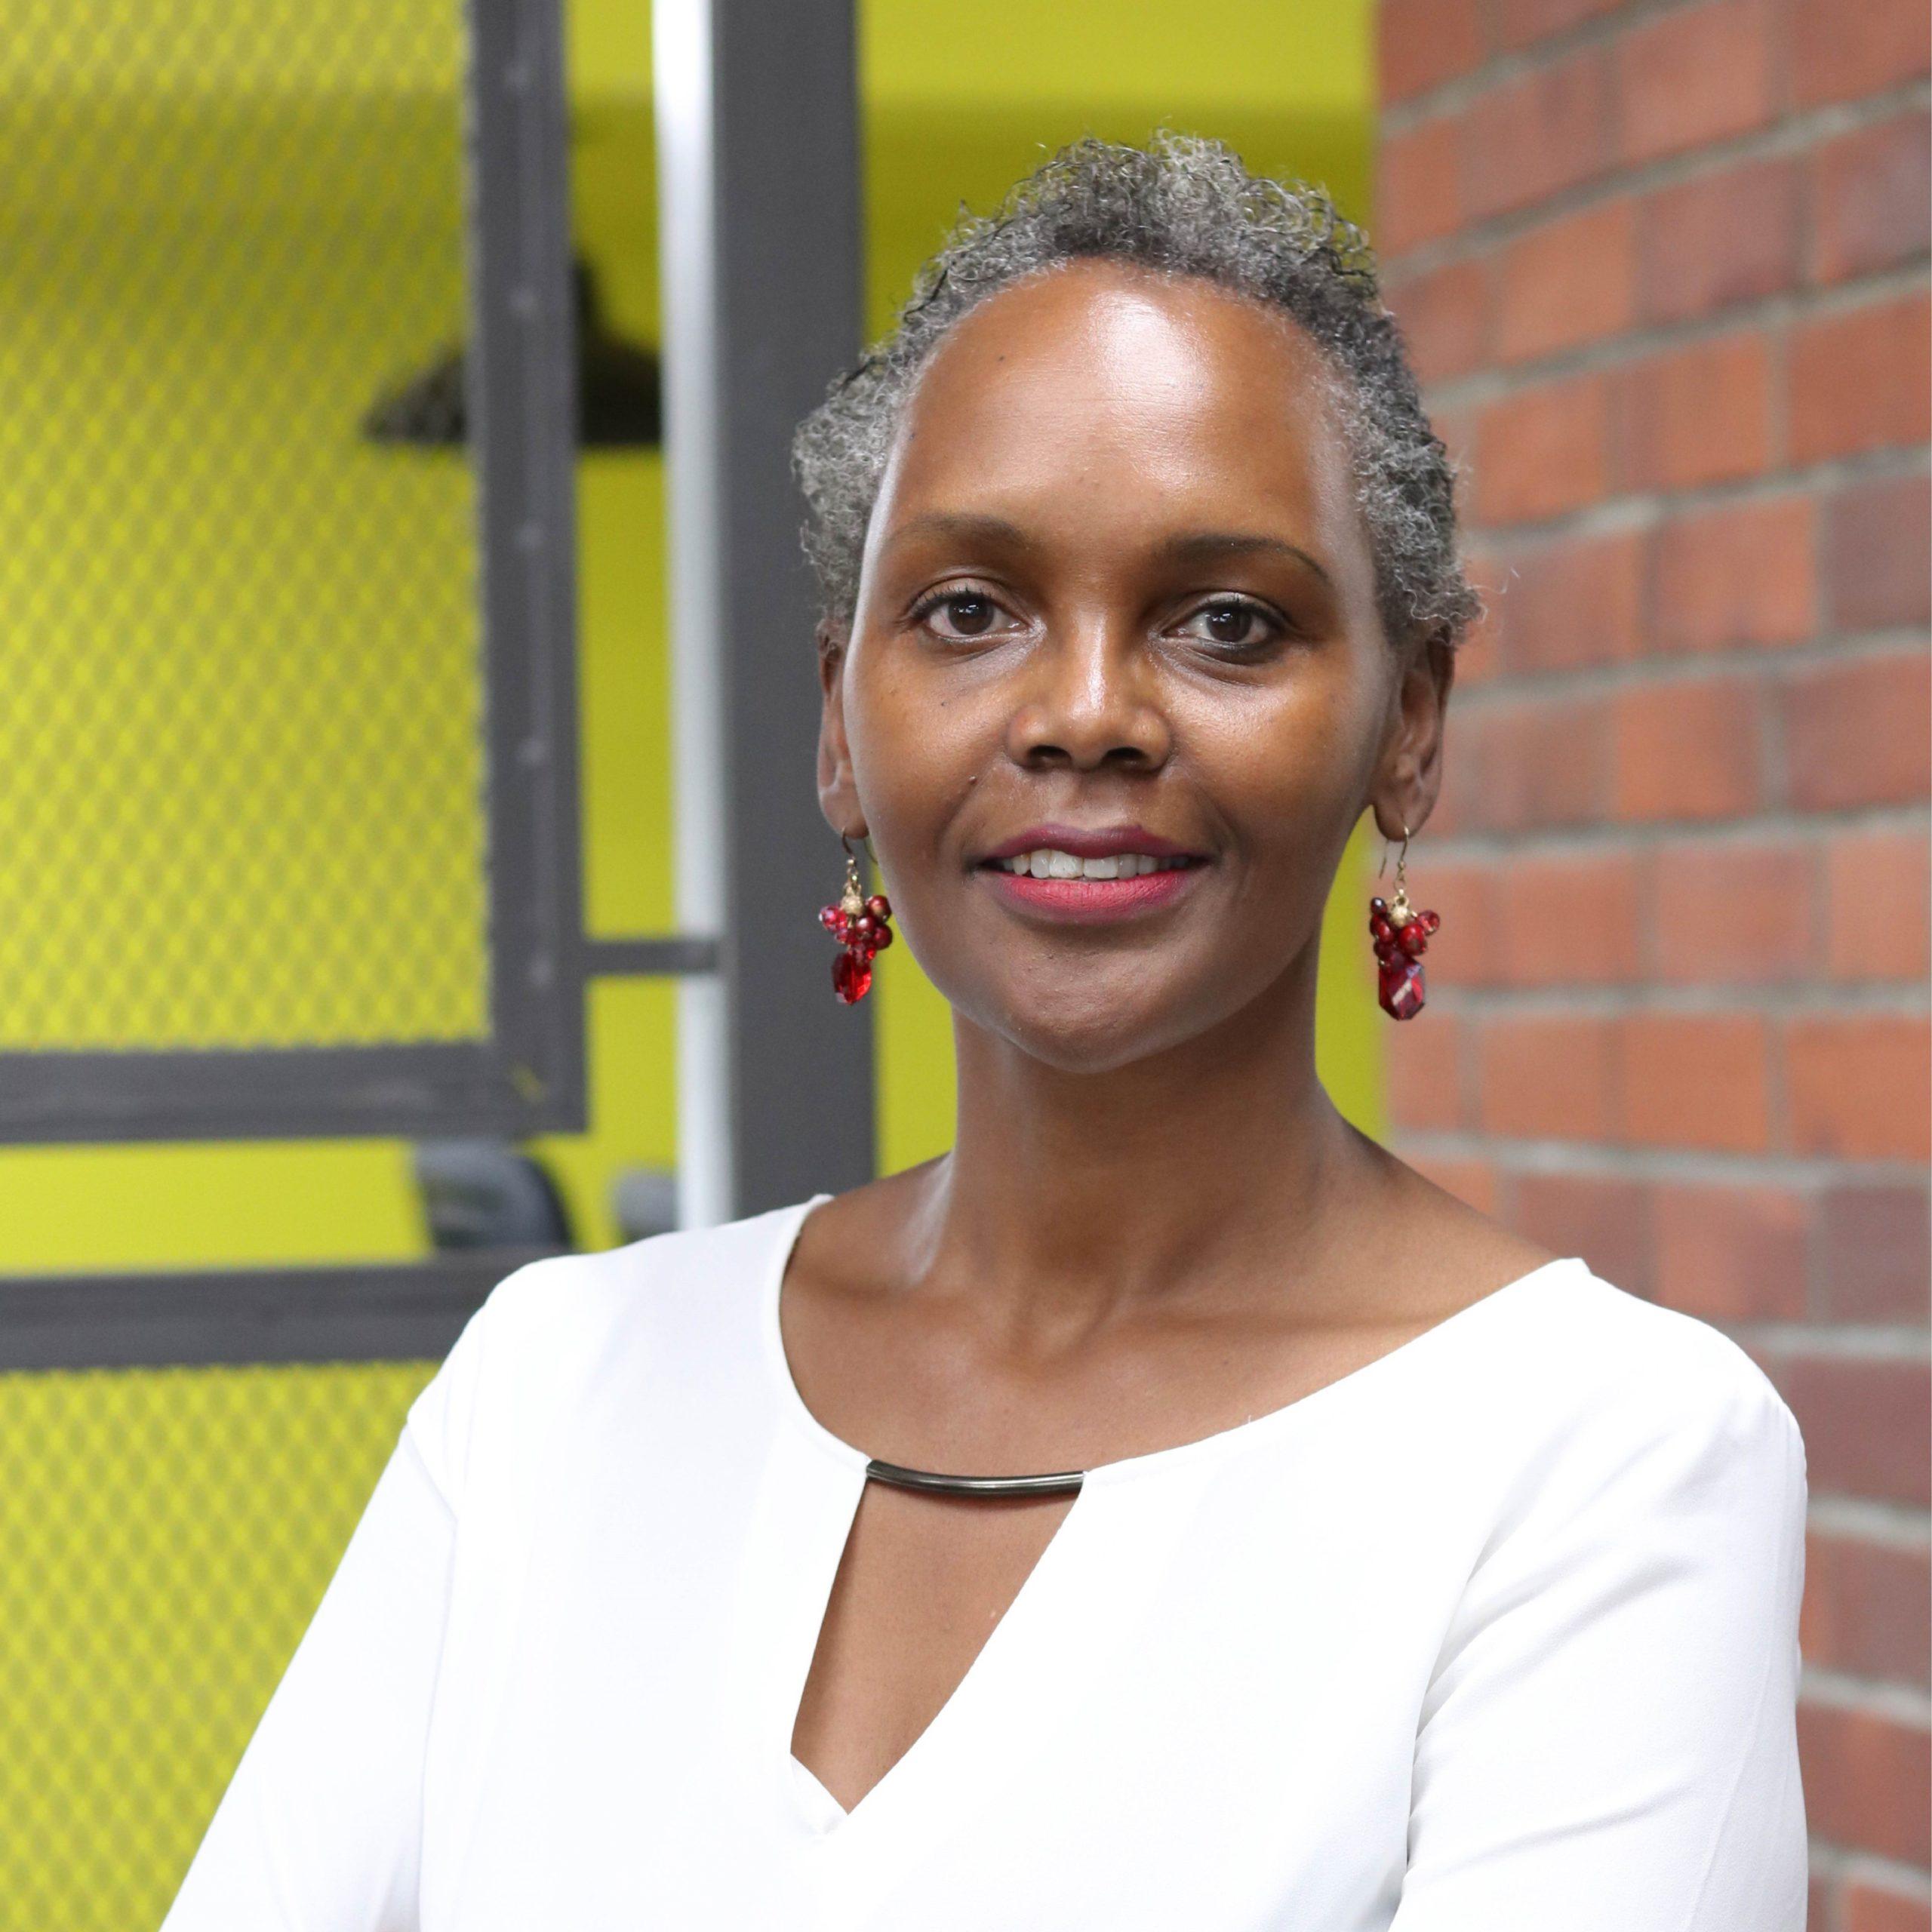 SWWE-Kenya-Co-Founder-And-Partnerships-Director-Eunice-Nyandat